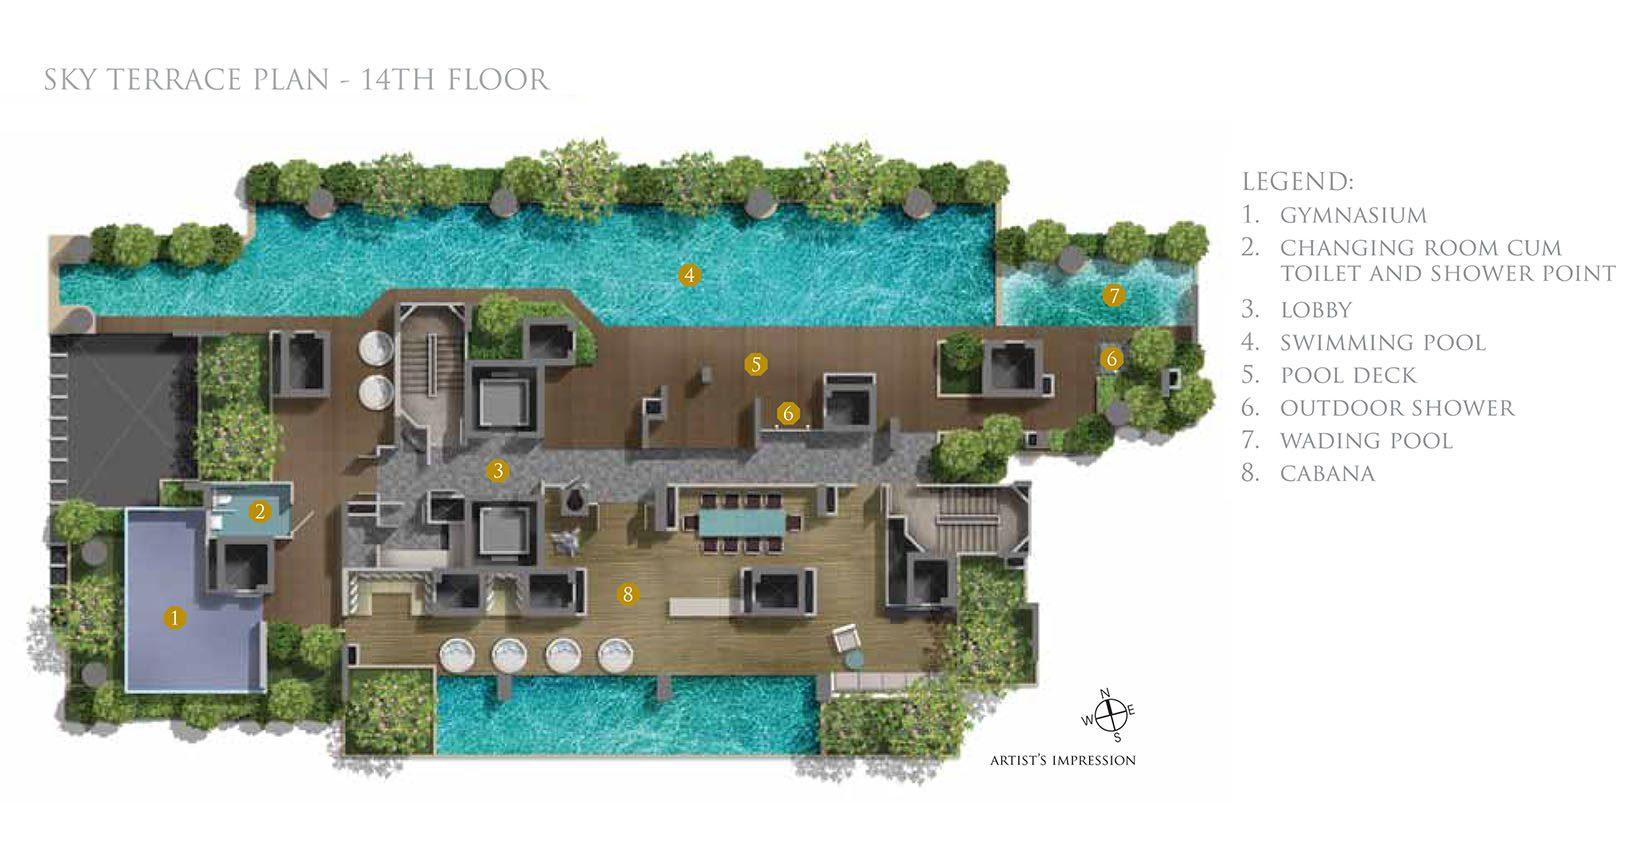 26-newton-sky-terrace-plan